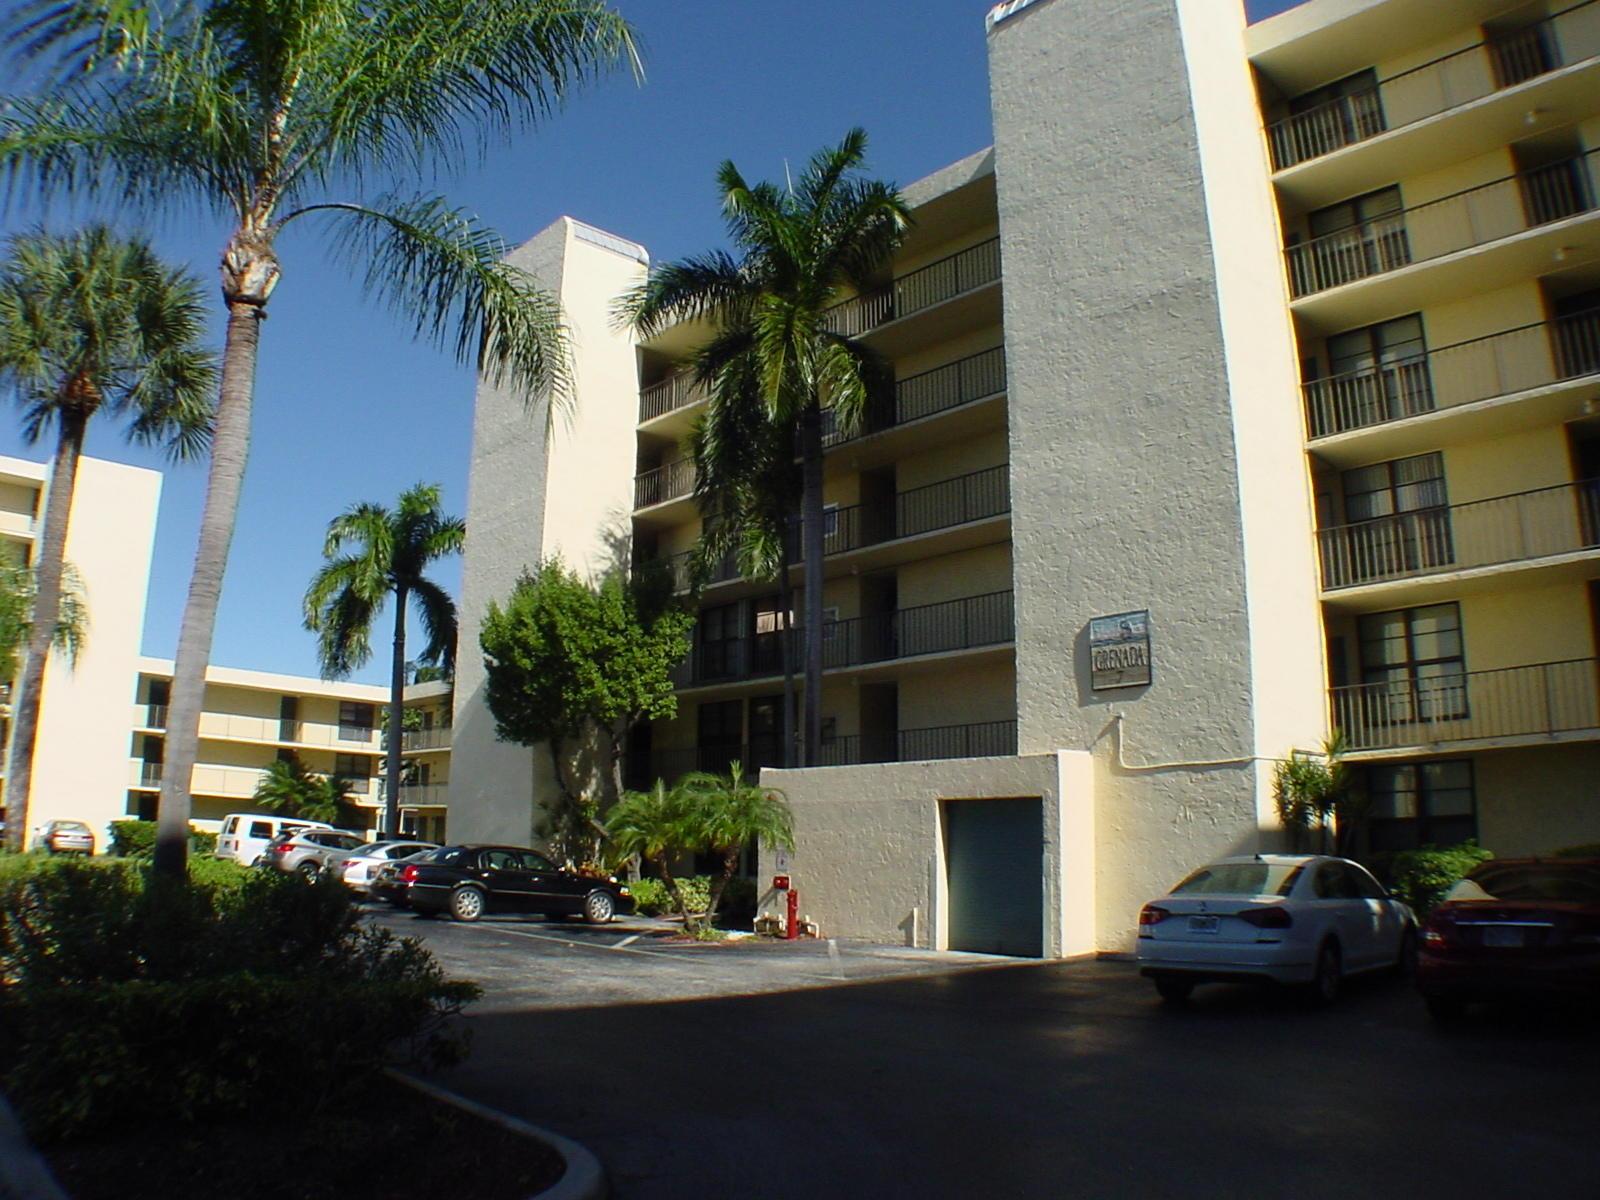 Boca Bayou 7 Royal-palm Way